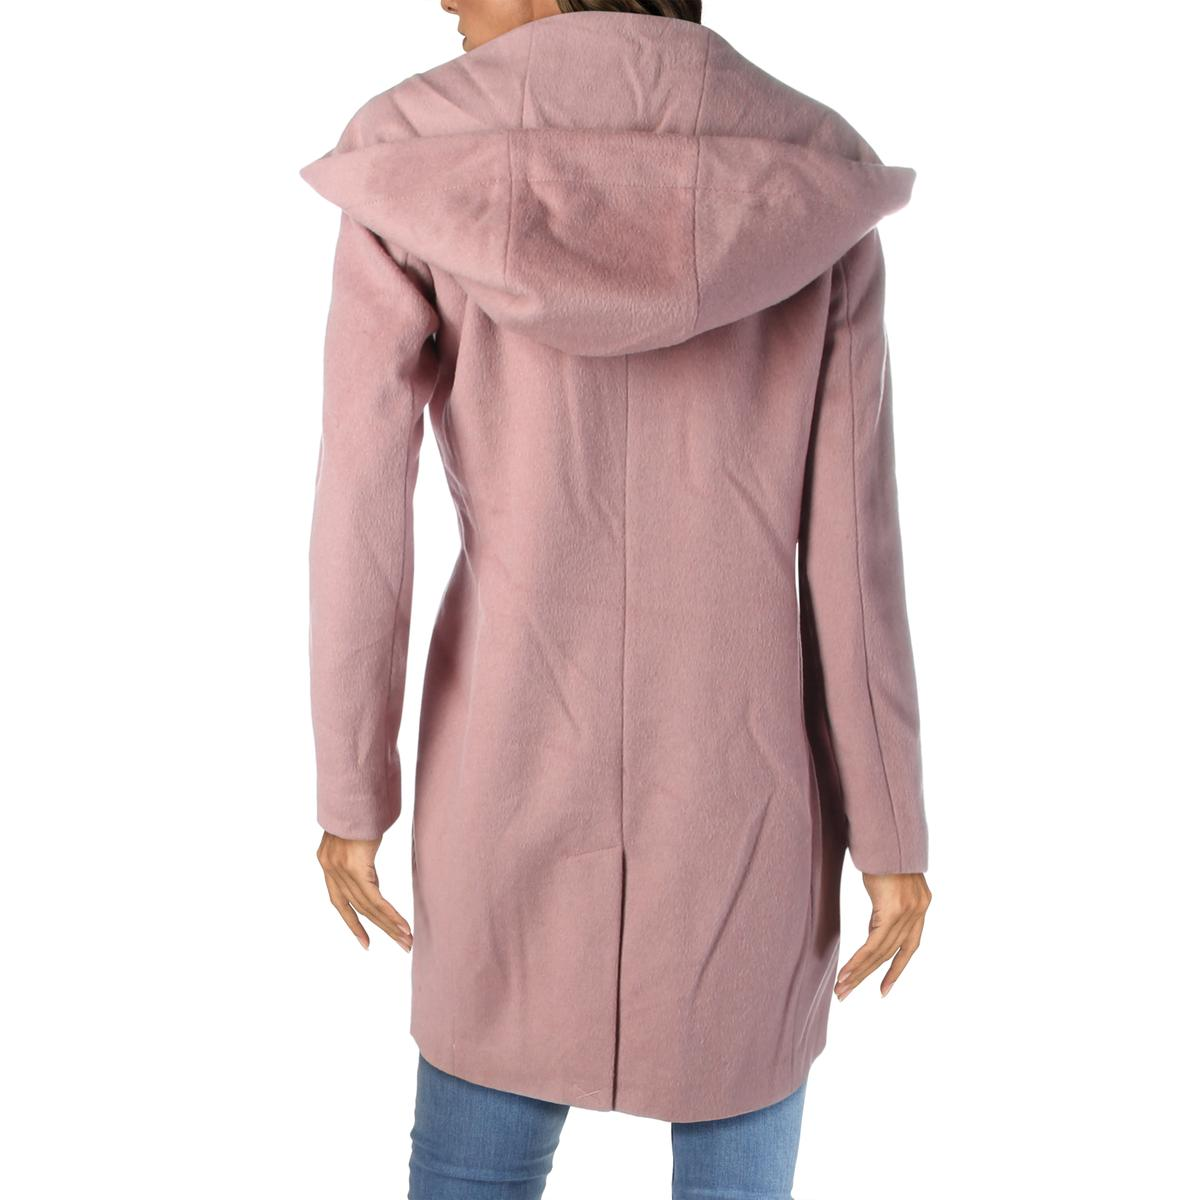 Karl-Lagerfeld-Paris-Womens-Winter-Wool-Blend-Midi-Coat-Outerwear-BHFO-6449 thumbnail 6